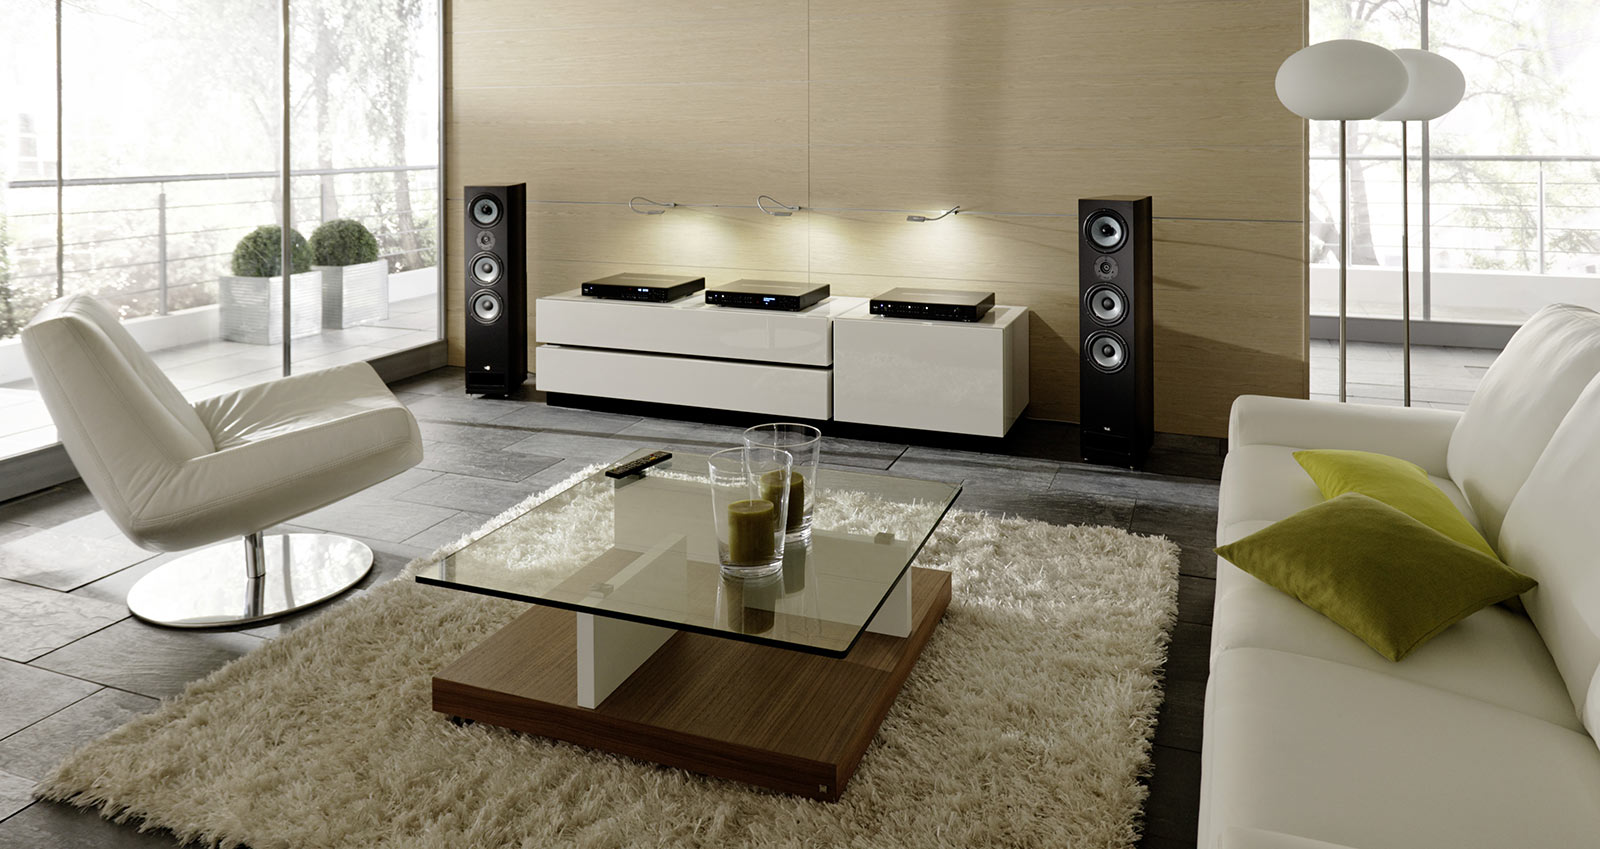 home-audio-design-2.jpg